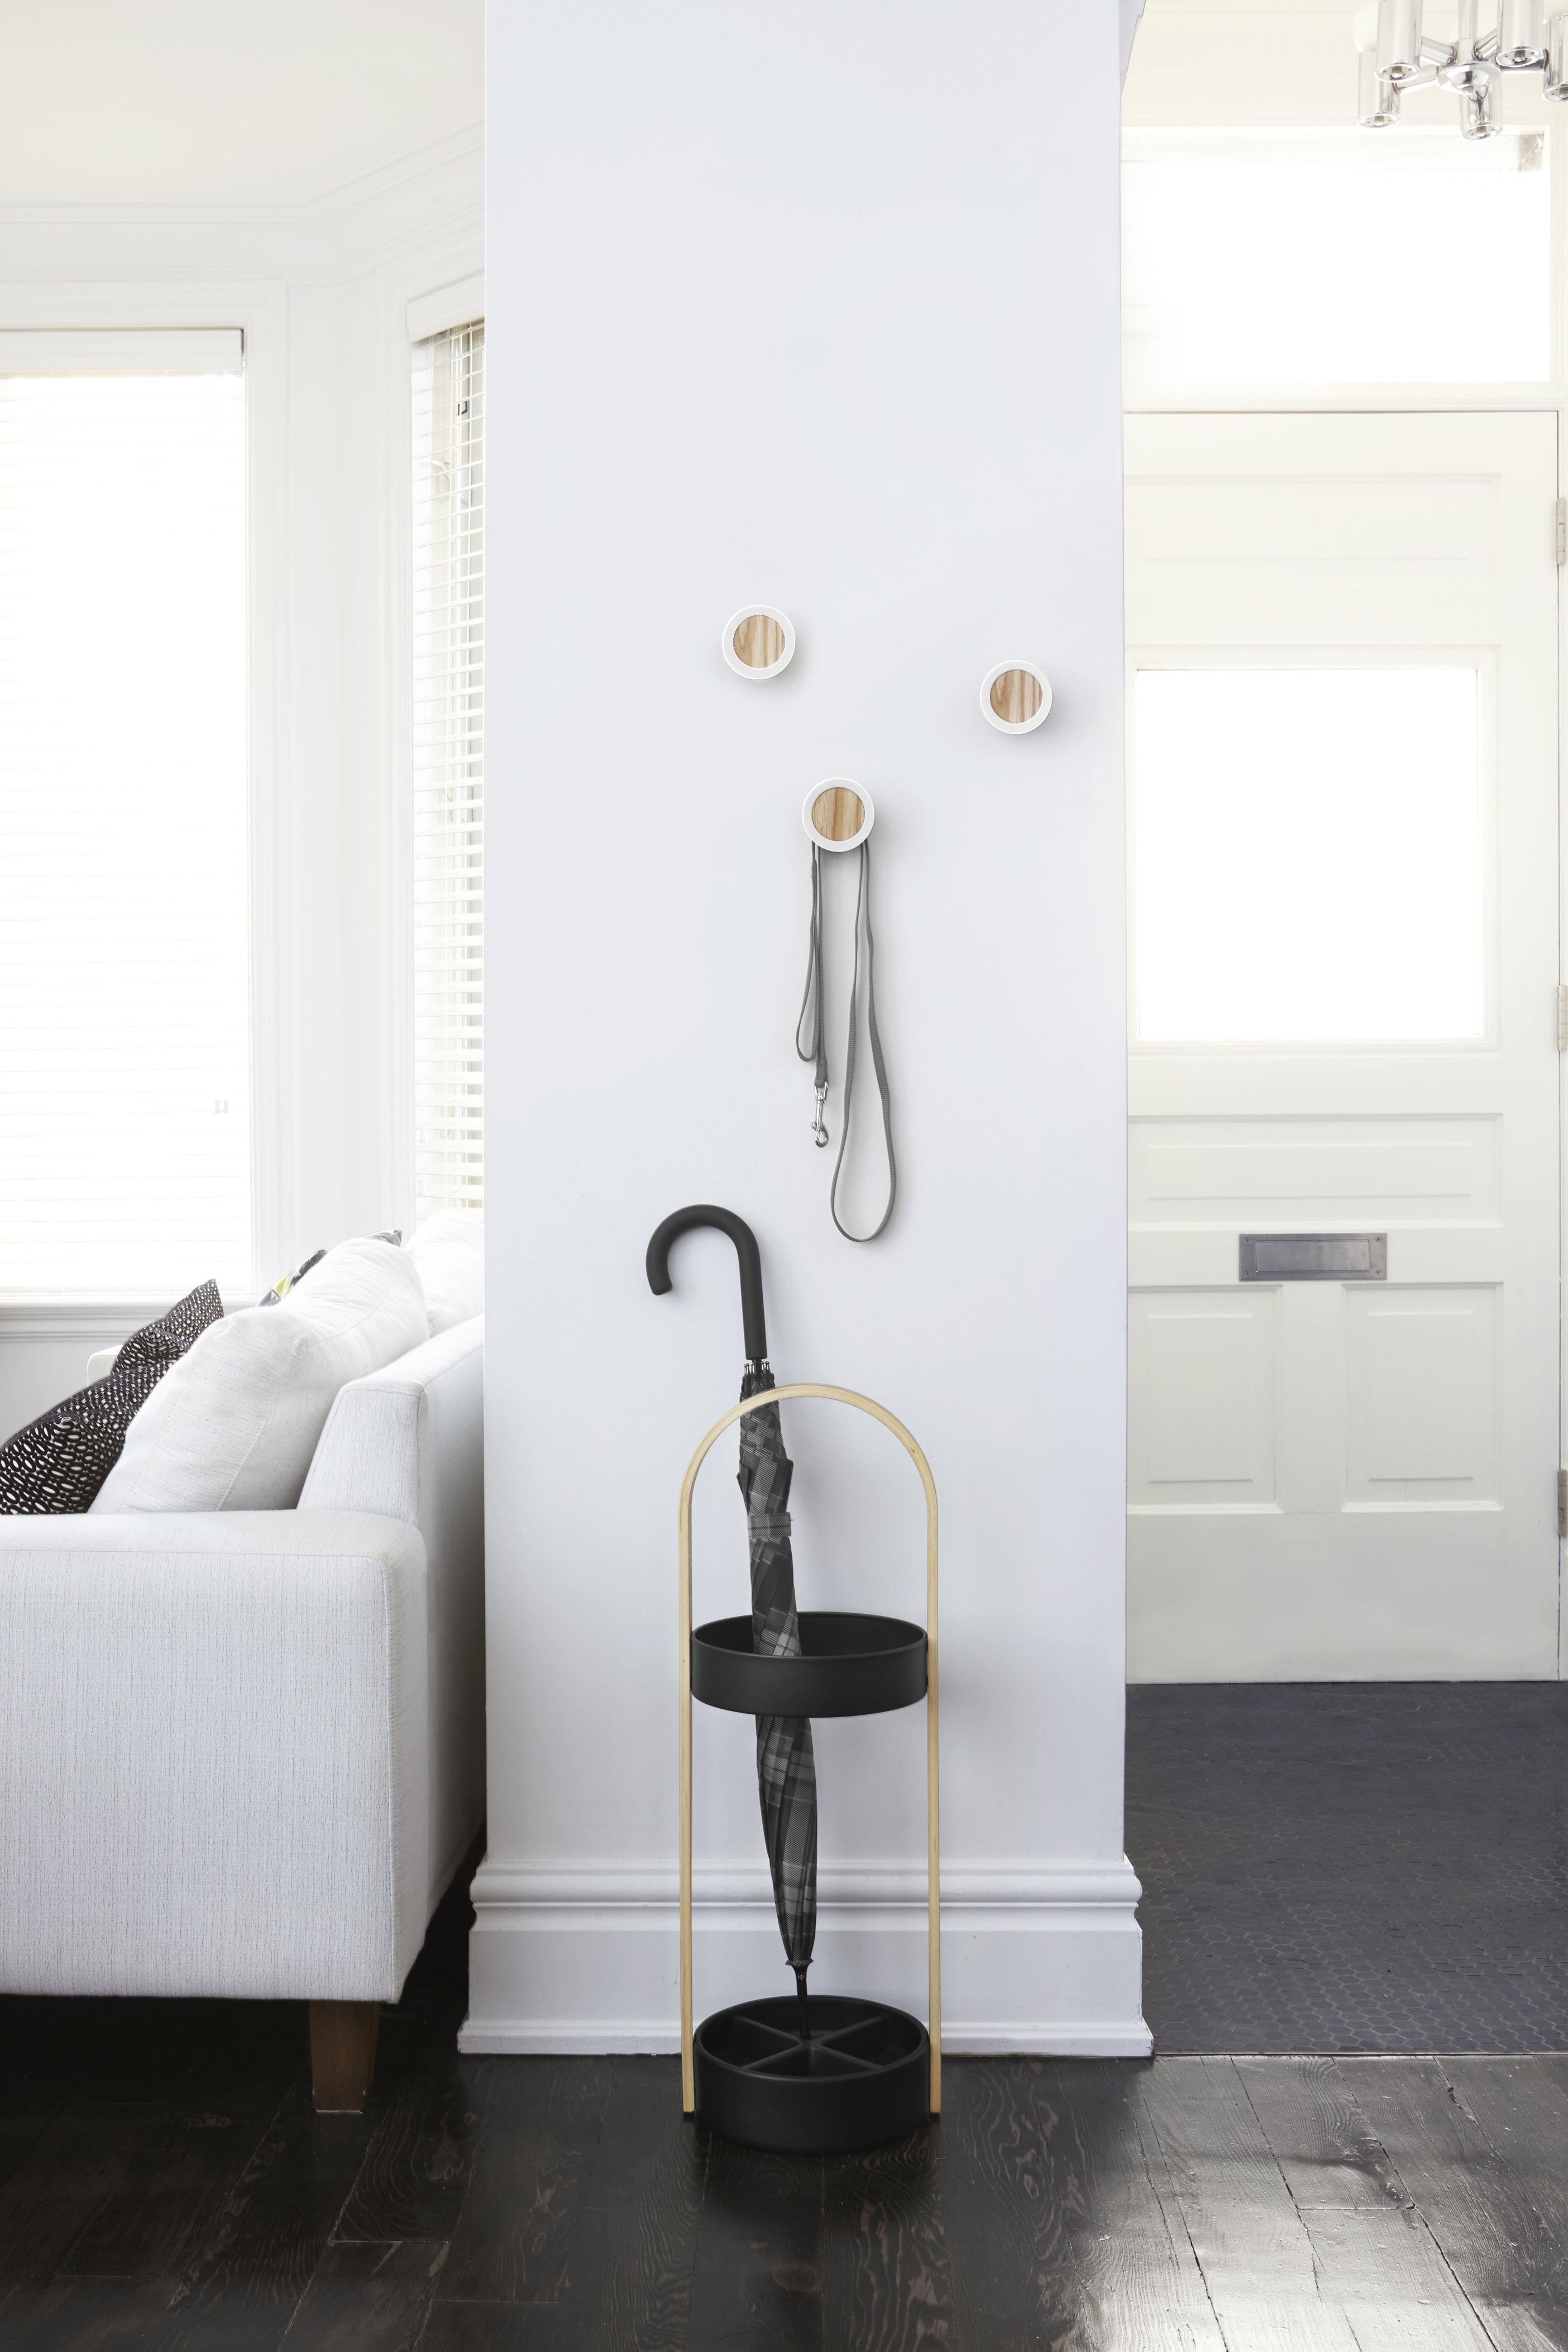 hub schirmst nder holz kunstharz buche natur schwarz by umbra made in design. Black Bedroom Furniture Sets. Home Design Ideas